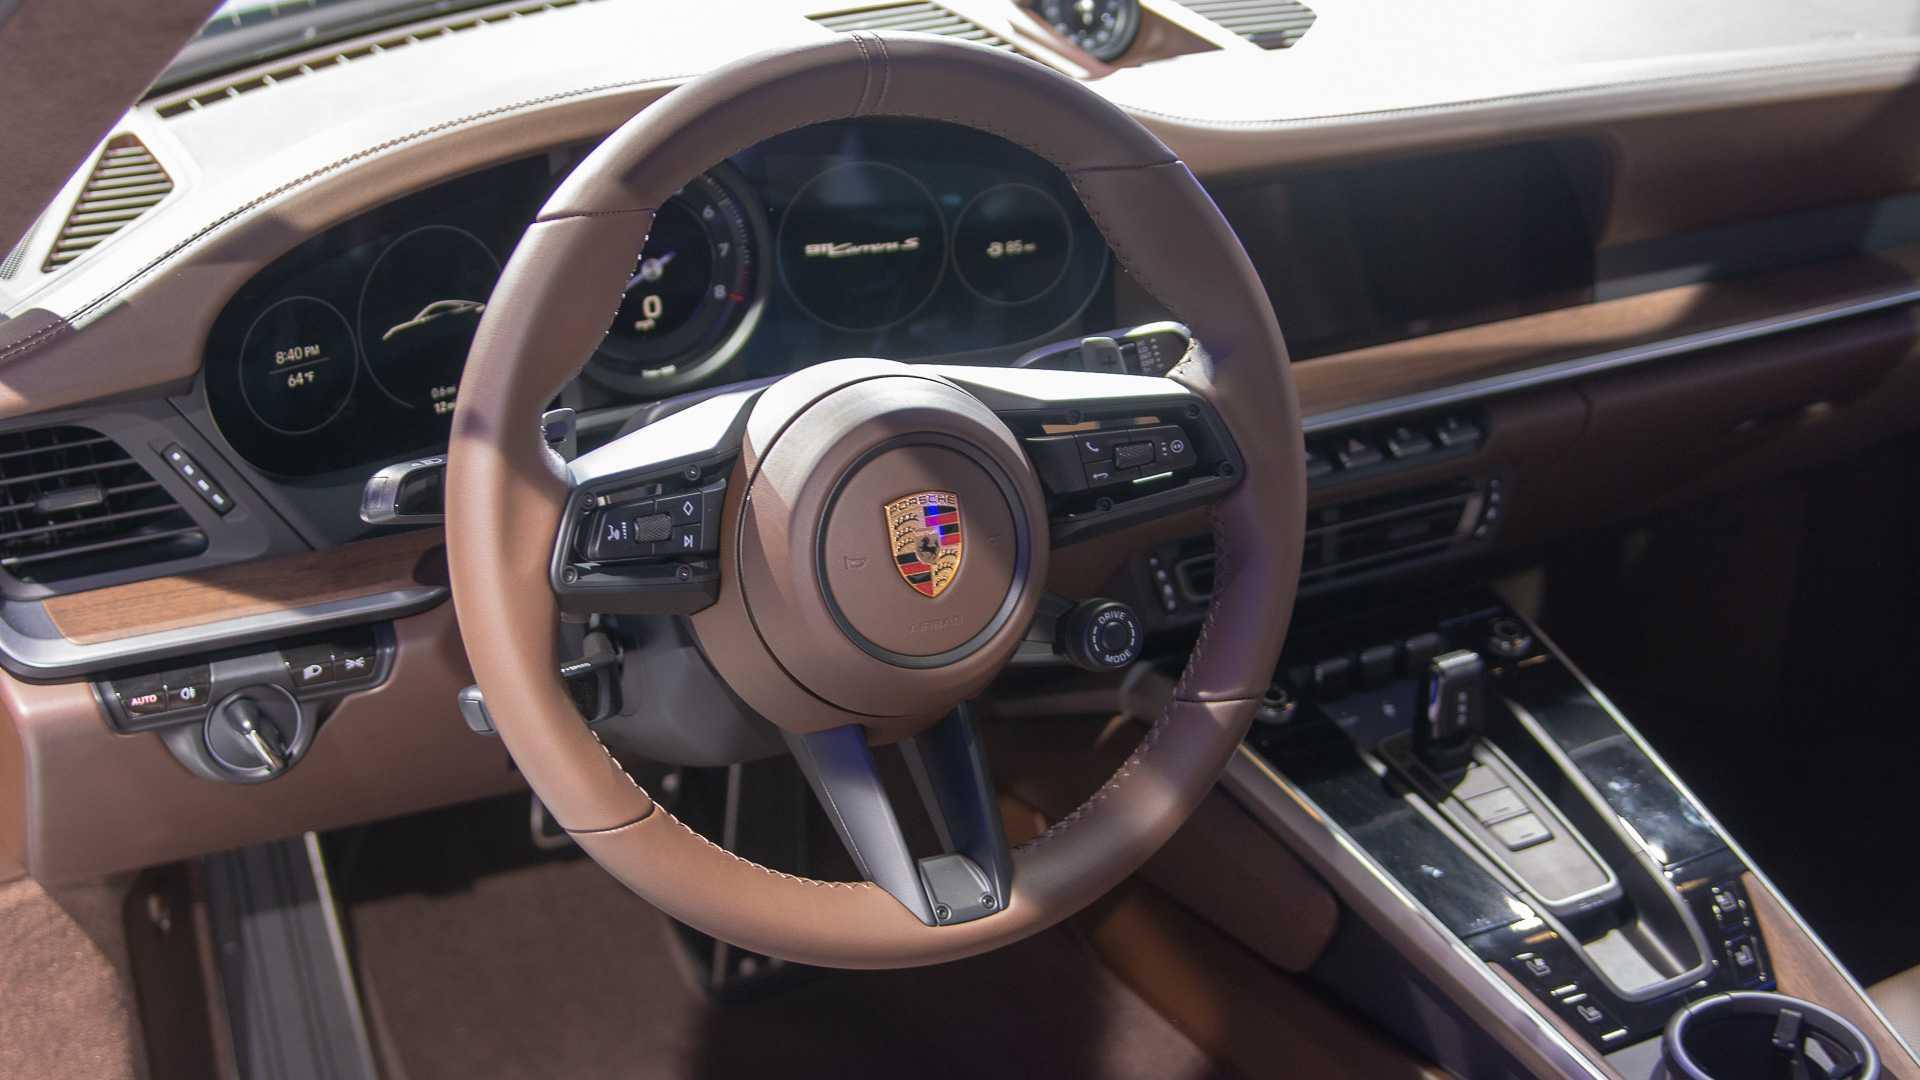 2020-porsche-911-carrera-s-6.jpg